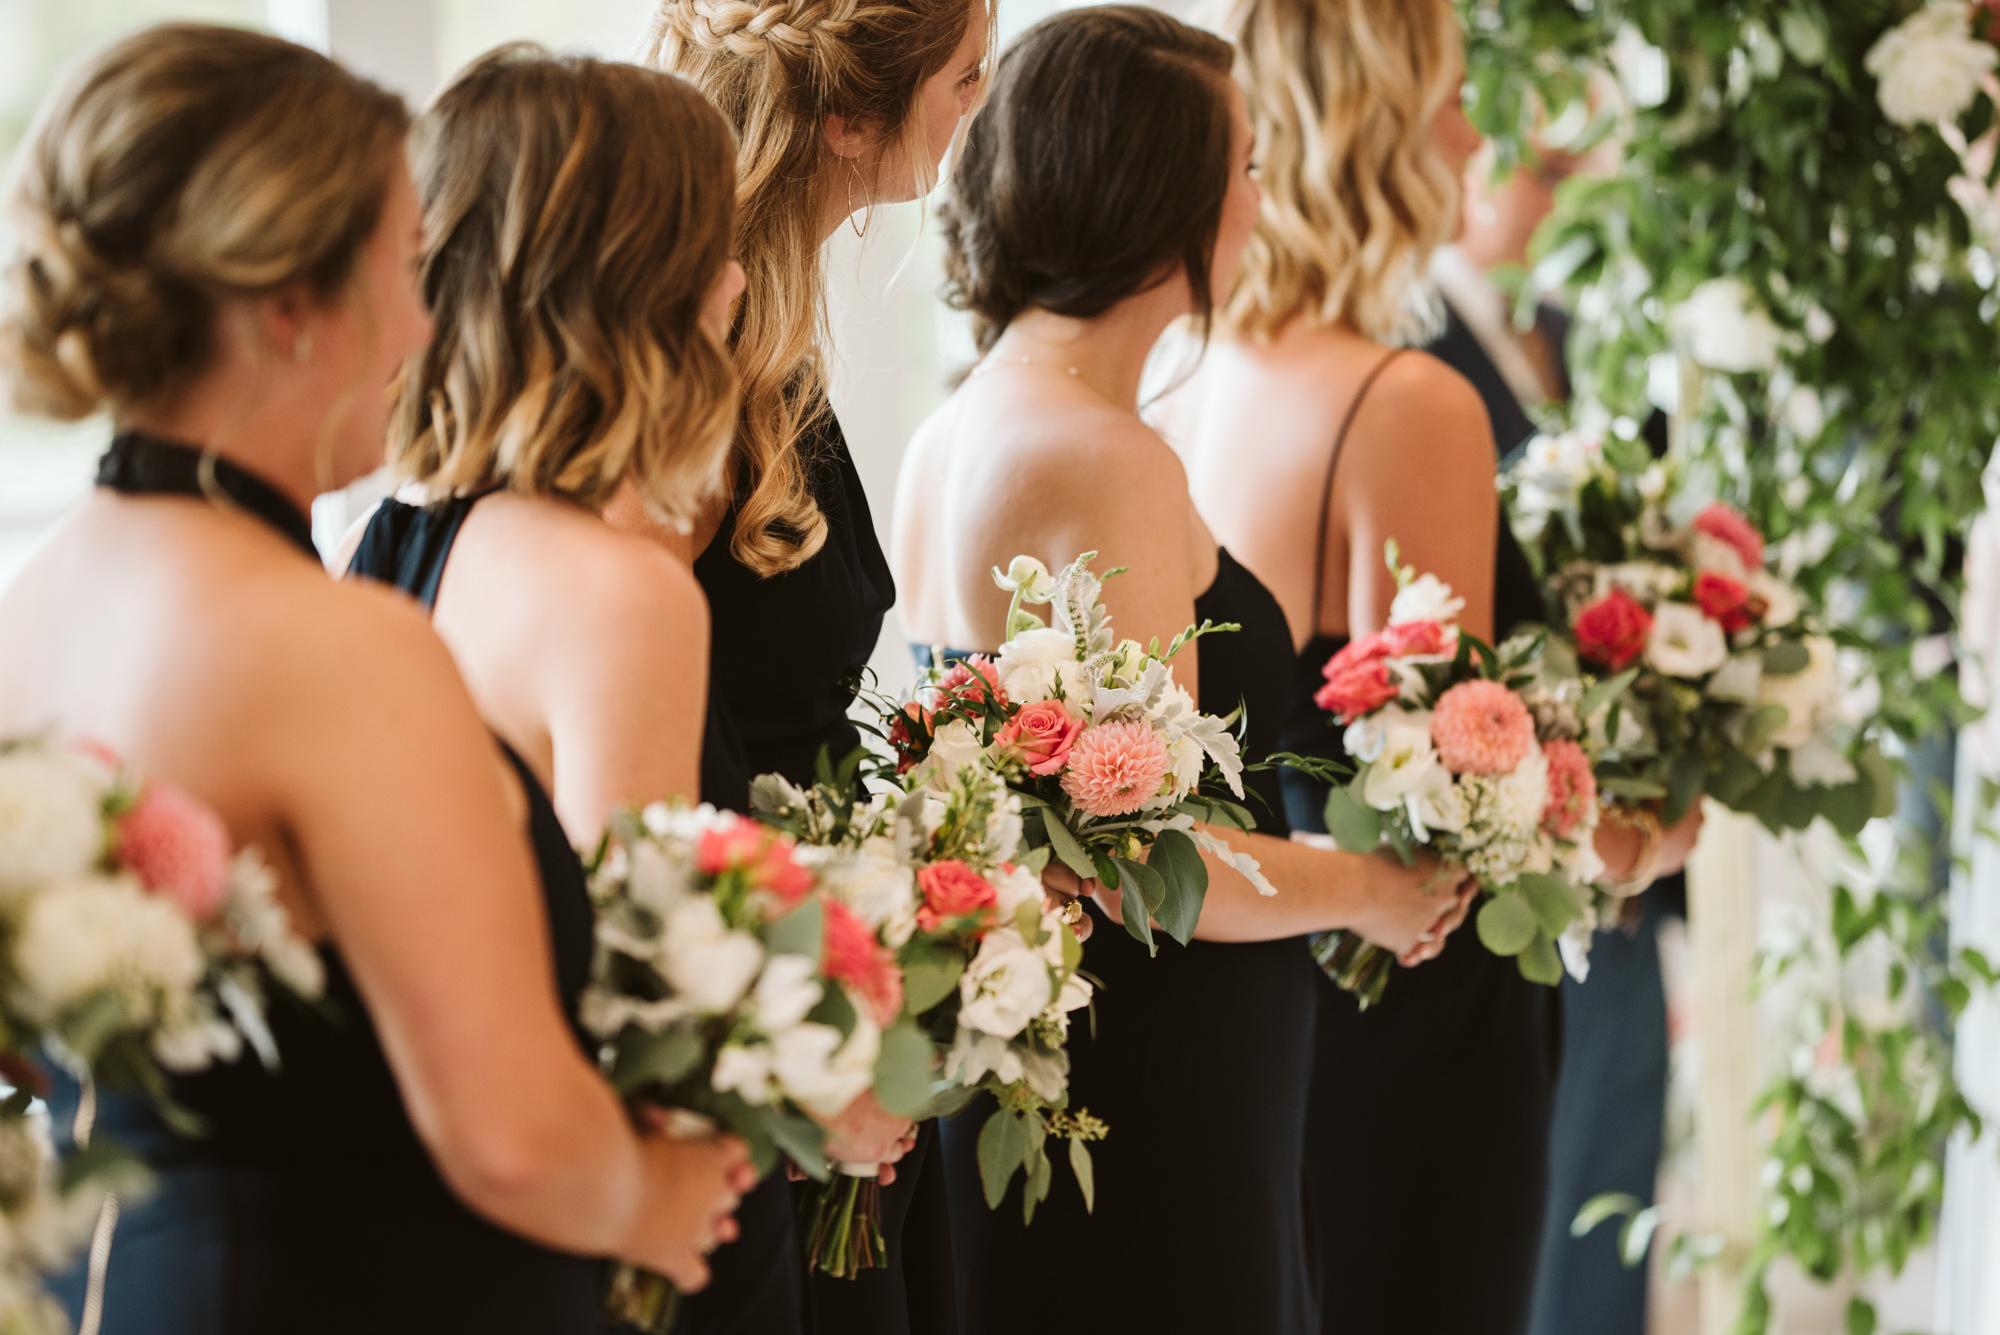 Elegant, Columbia Country Club, Chevy Chase Maryland, Baltimore Wedding Photographer, Classic, Traditional, Jewish Wedding, Bridesmaids with Black Shona Joy Dresses, Meg Owen Floral Designs